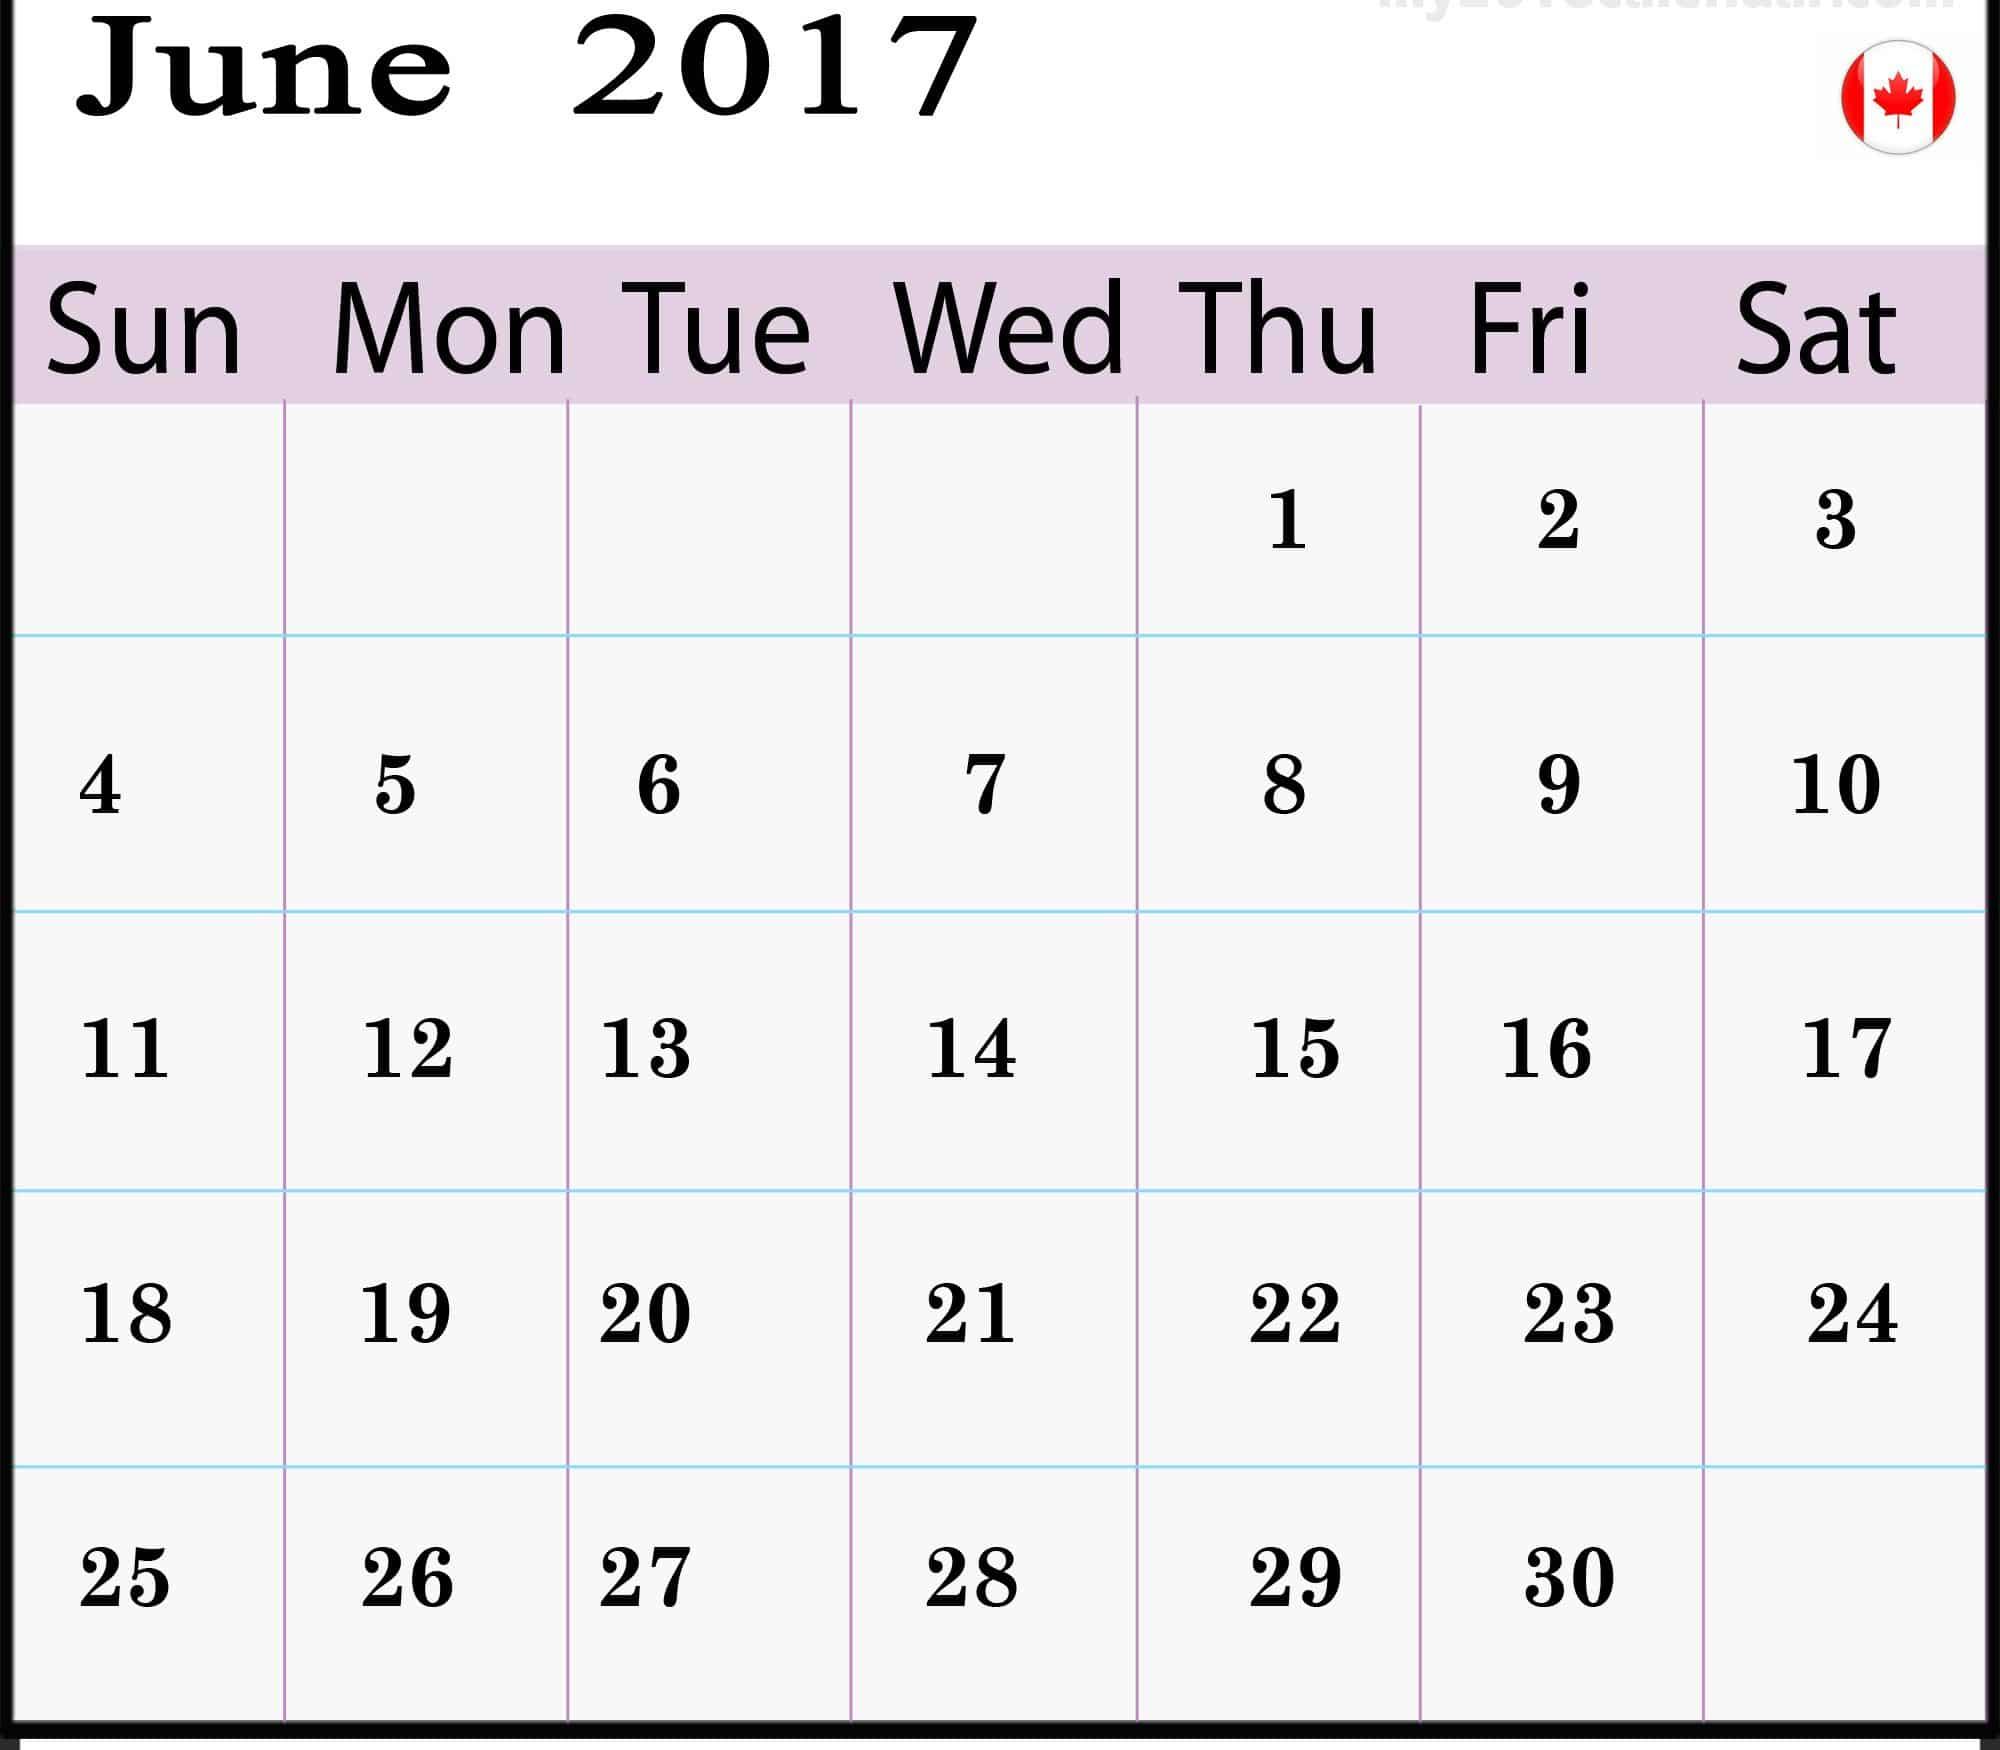 June 2017 calendar Chart Canada